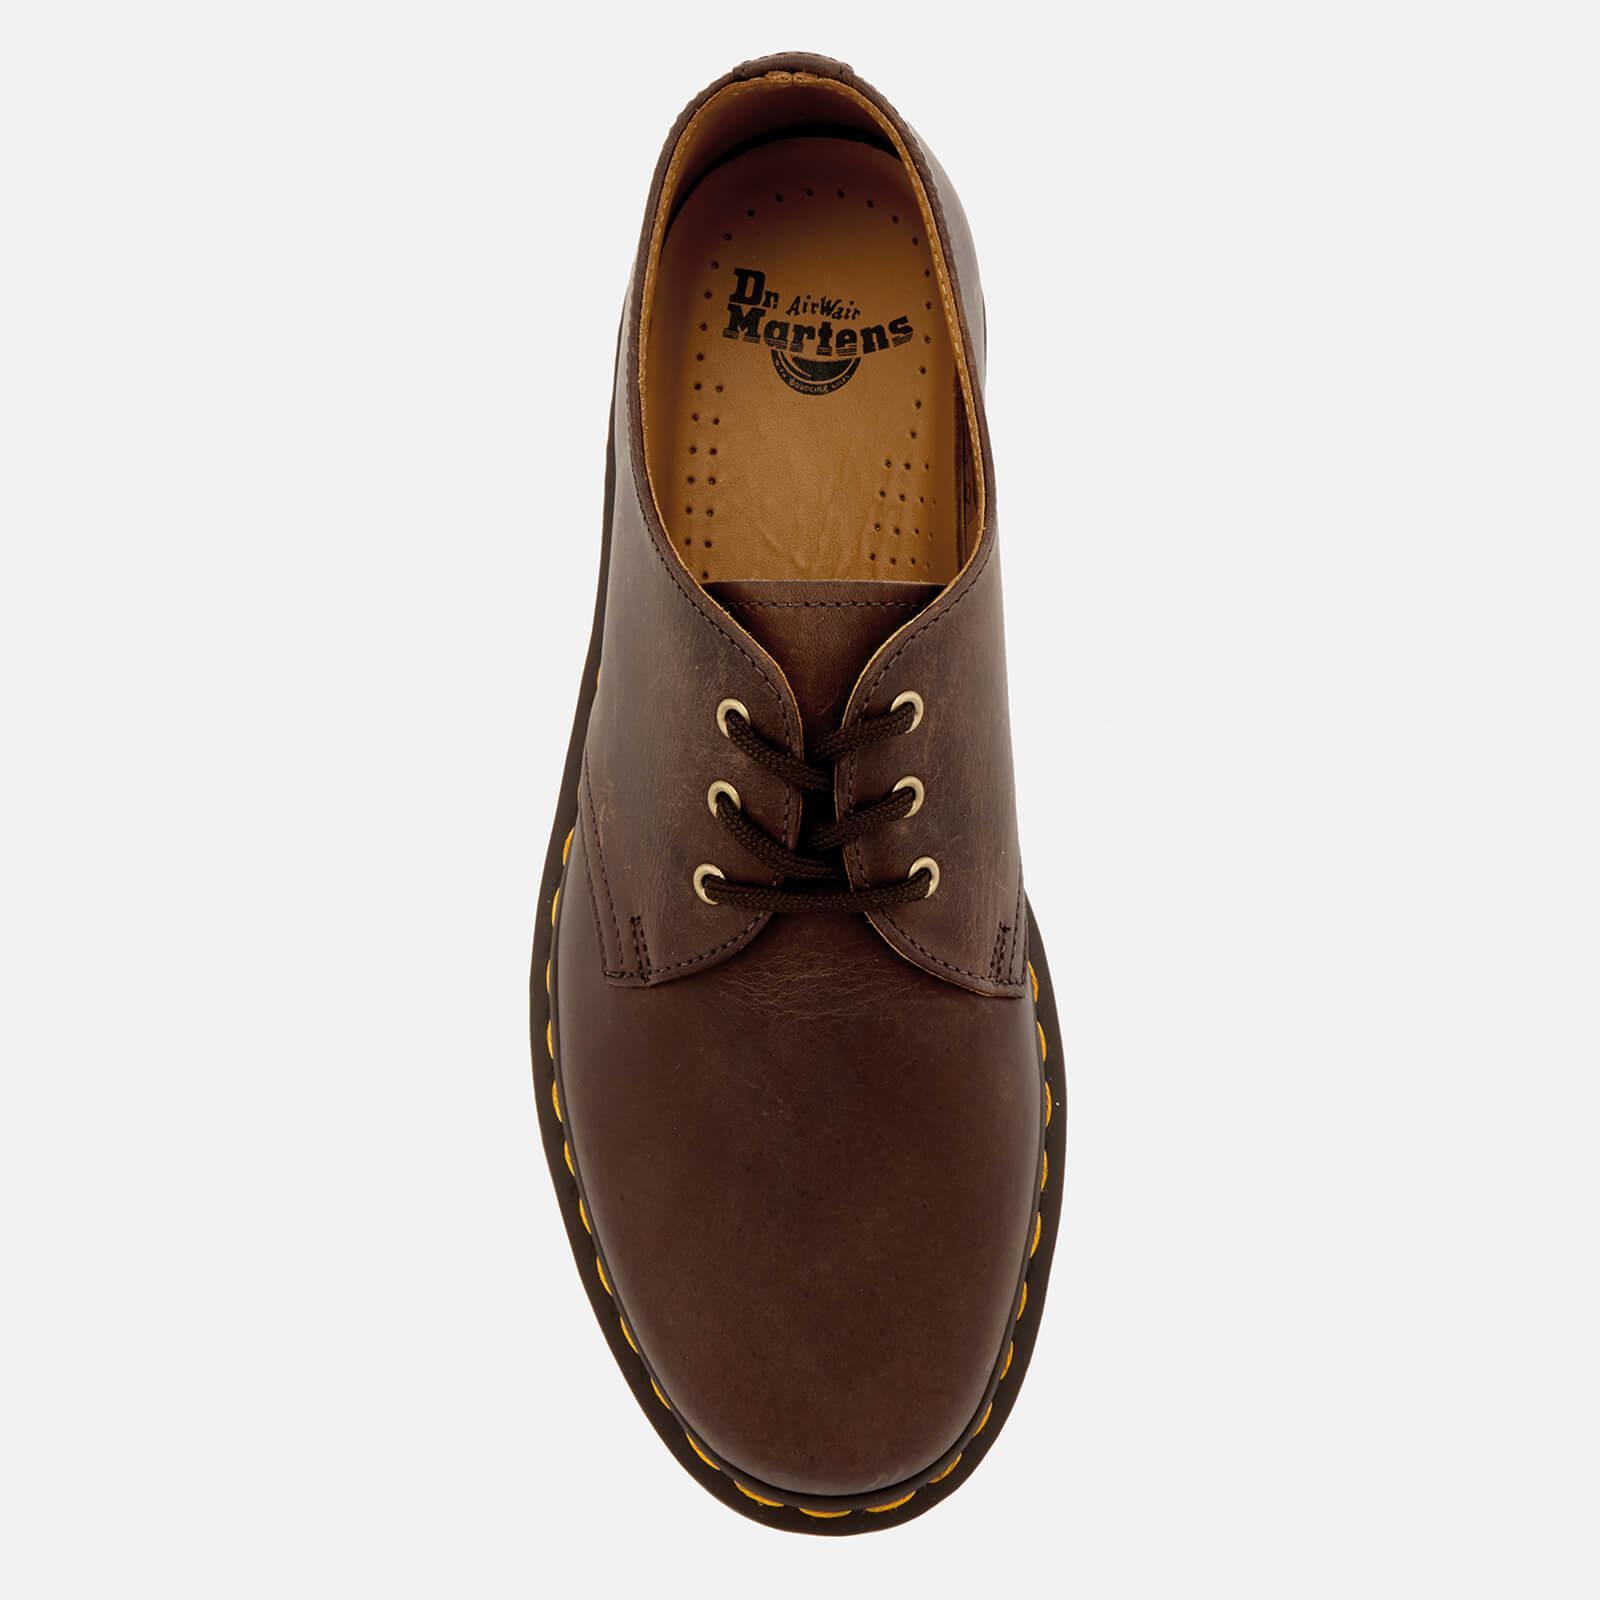 81d0d719a43 Dr. Martens Brown 1461 Crazy Horse Leather 3-eye Shoes for men